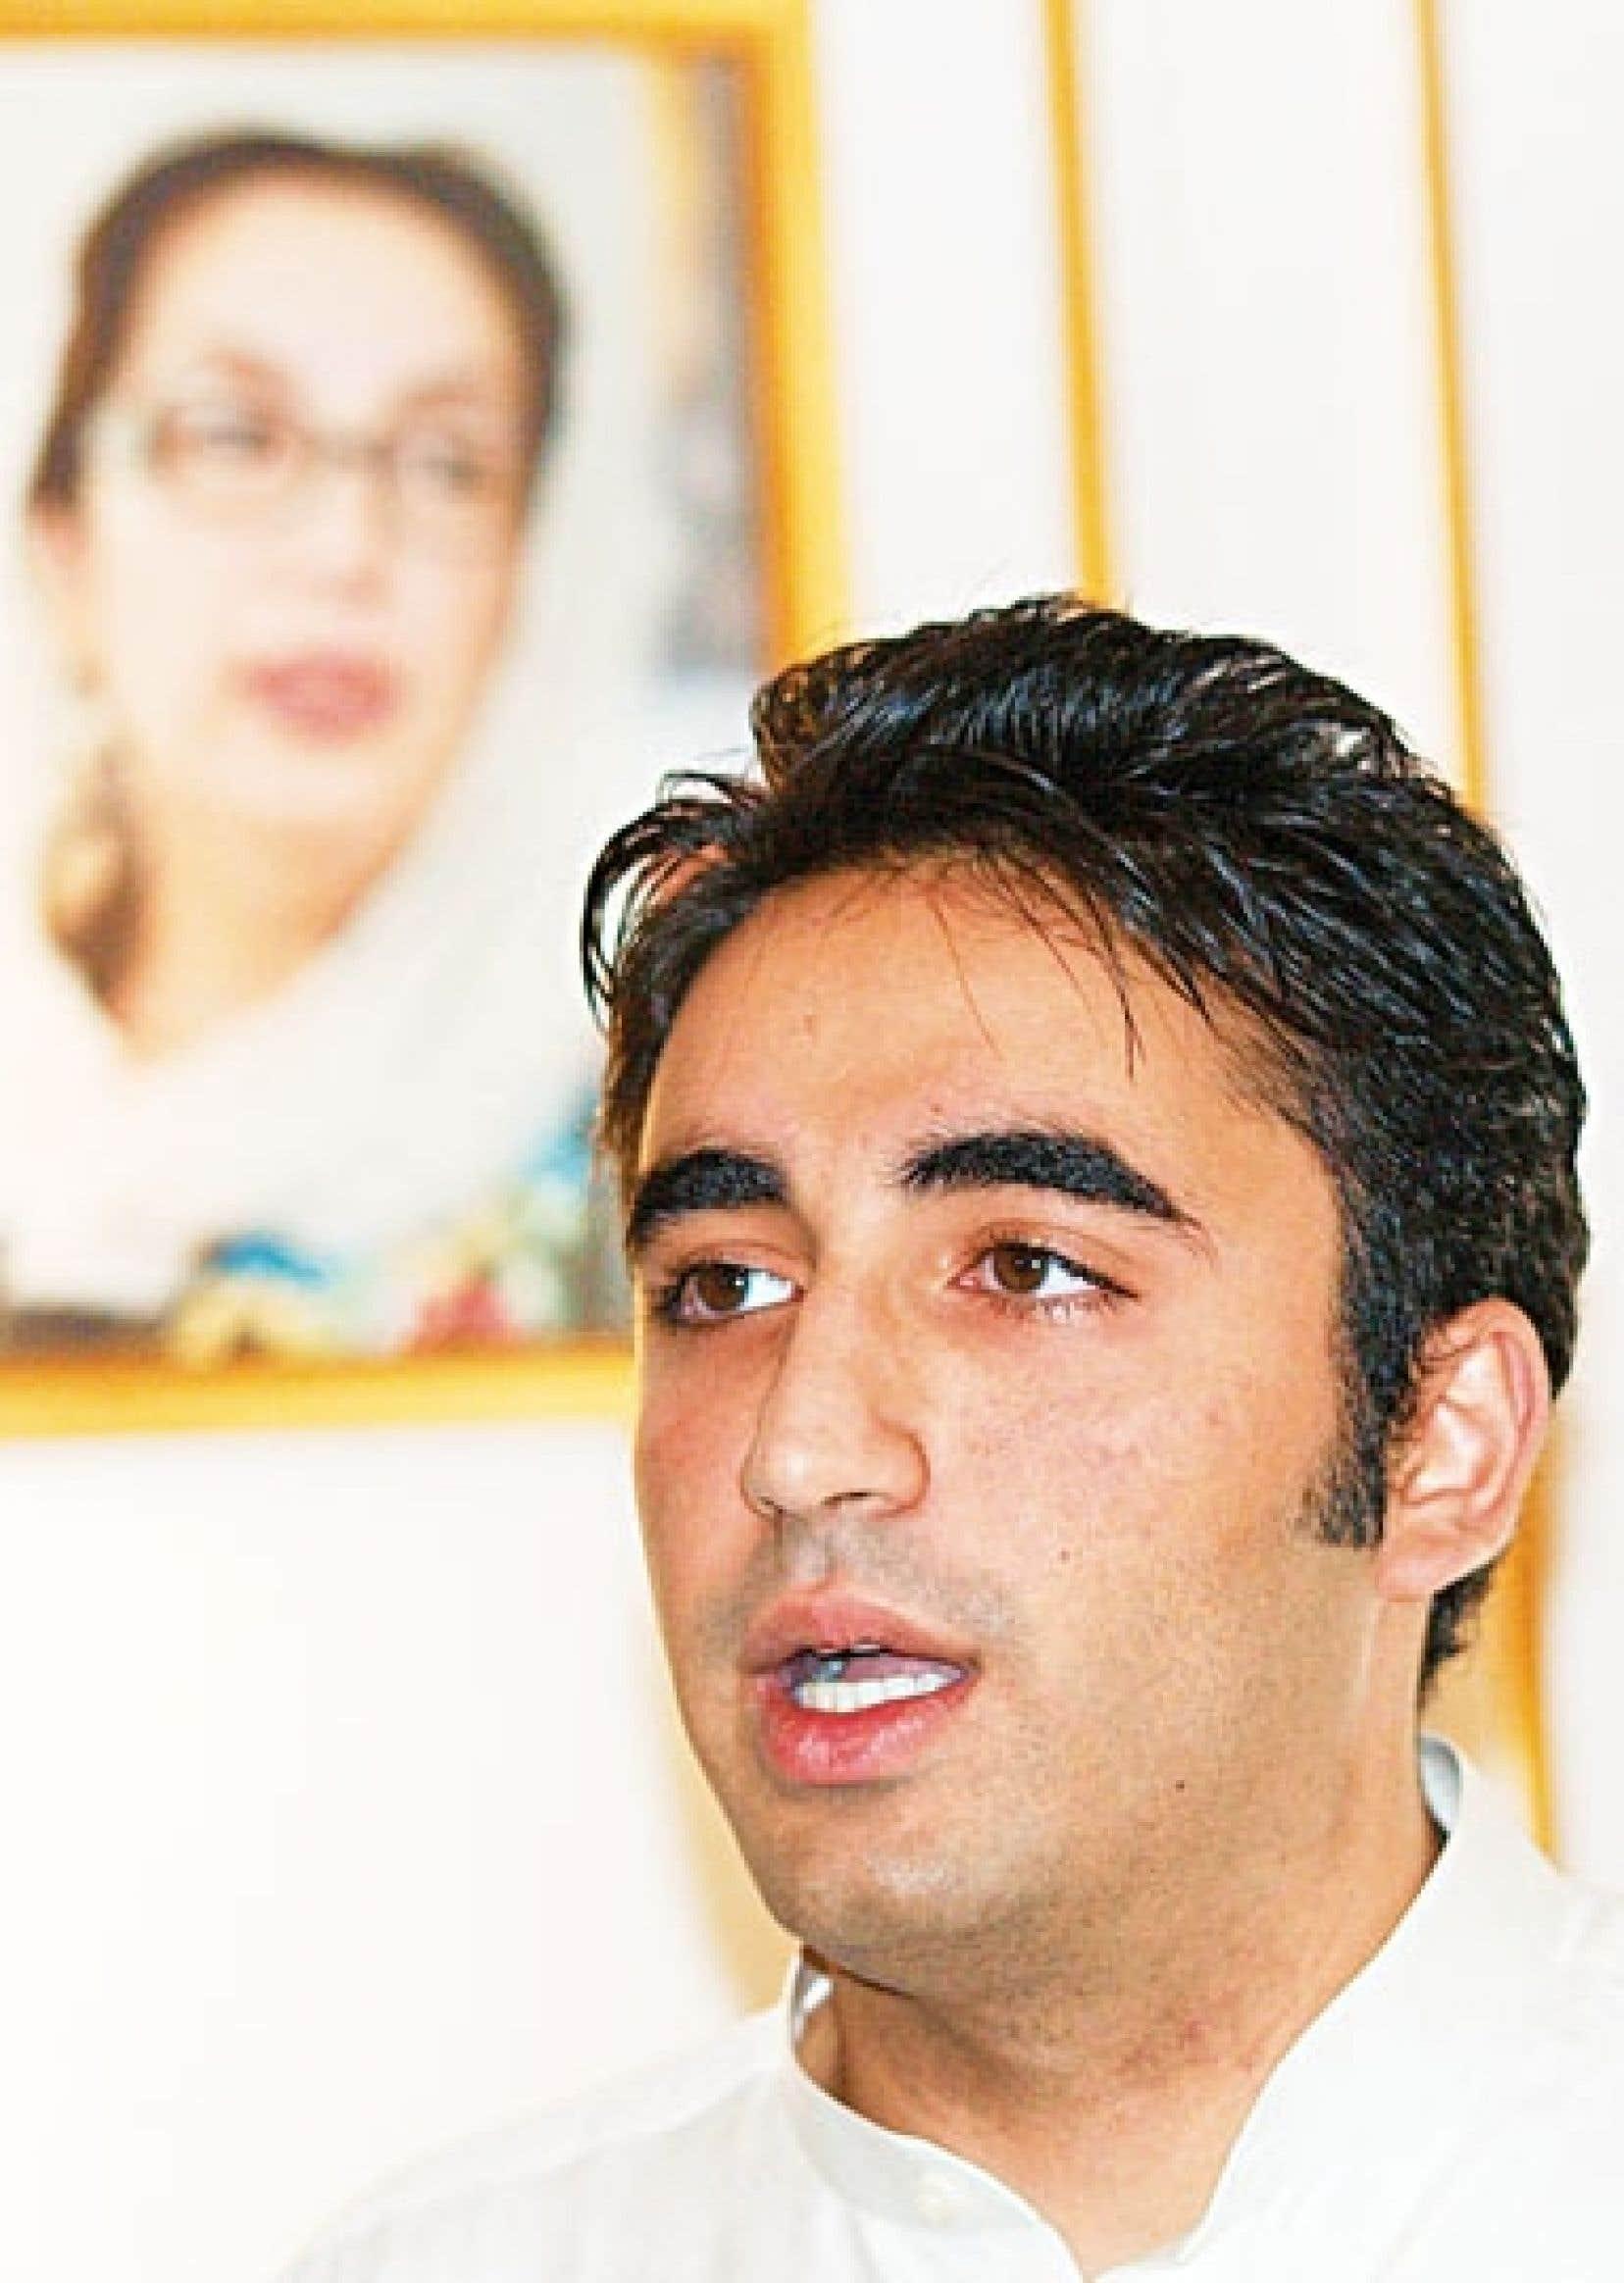 Bilawal Zardari-Bhutto